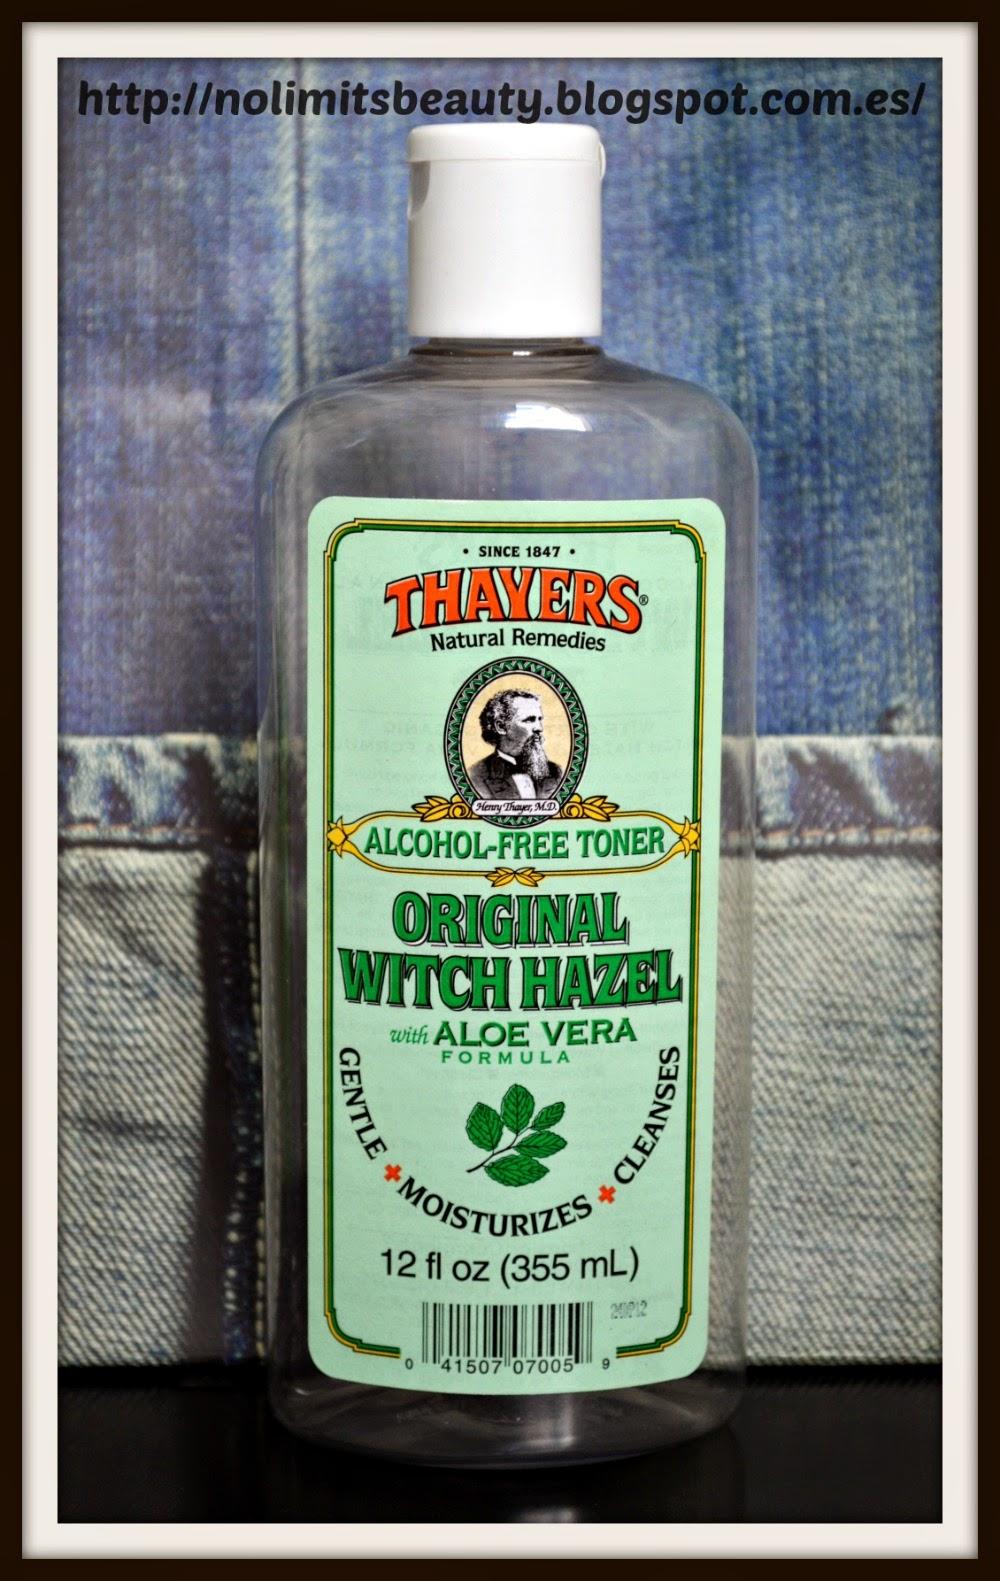 Thayers - Original Witch Hazel con Aloe Vera